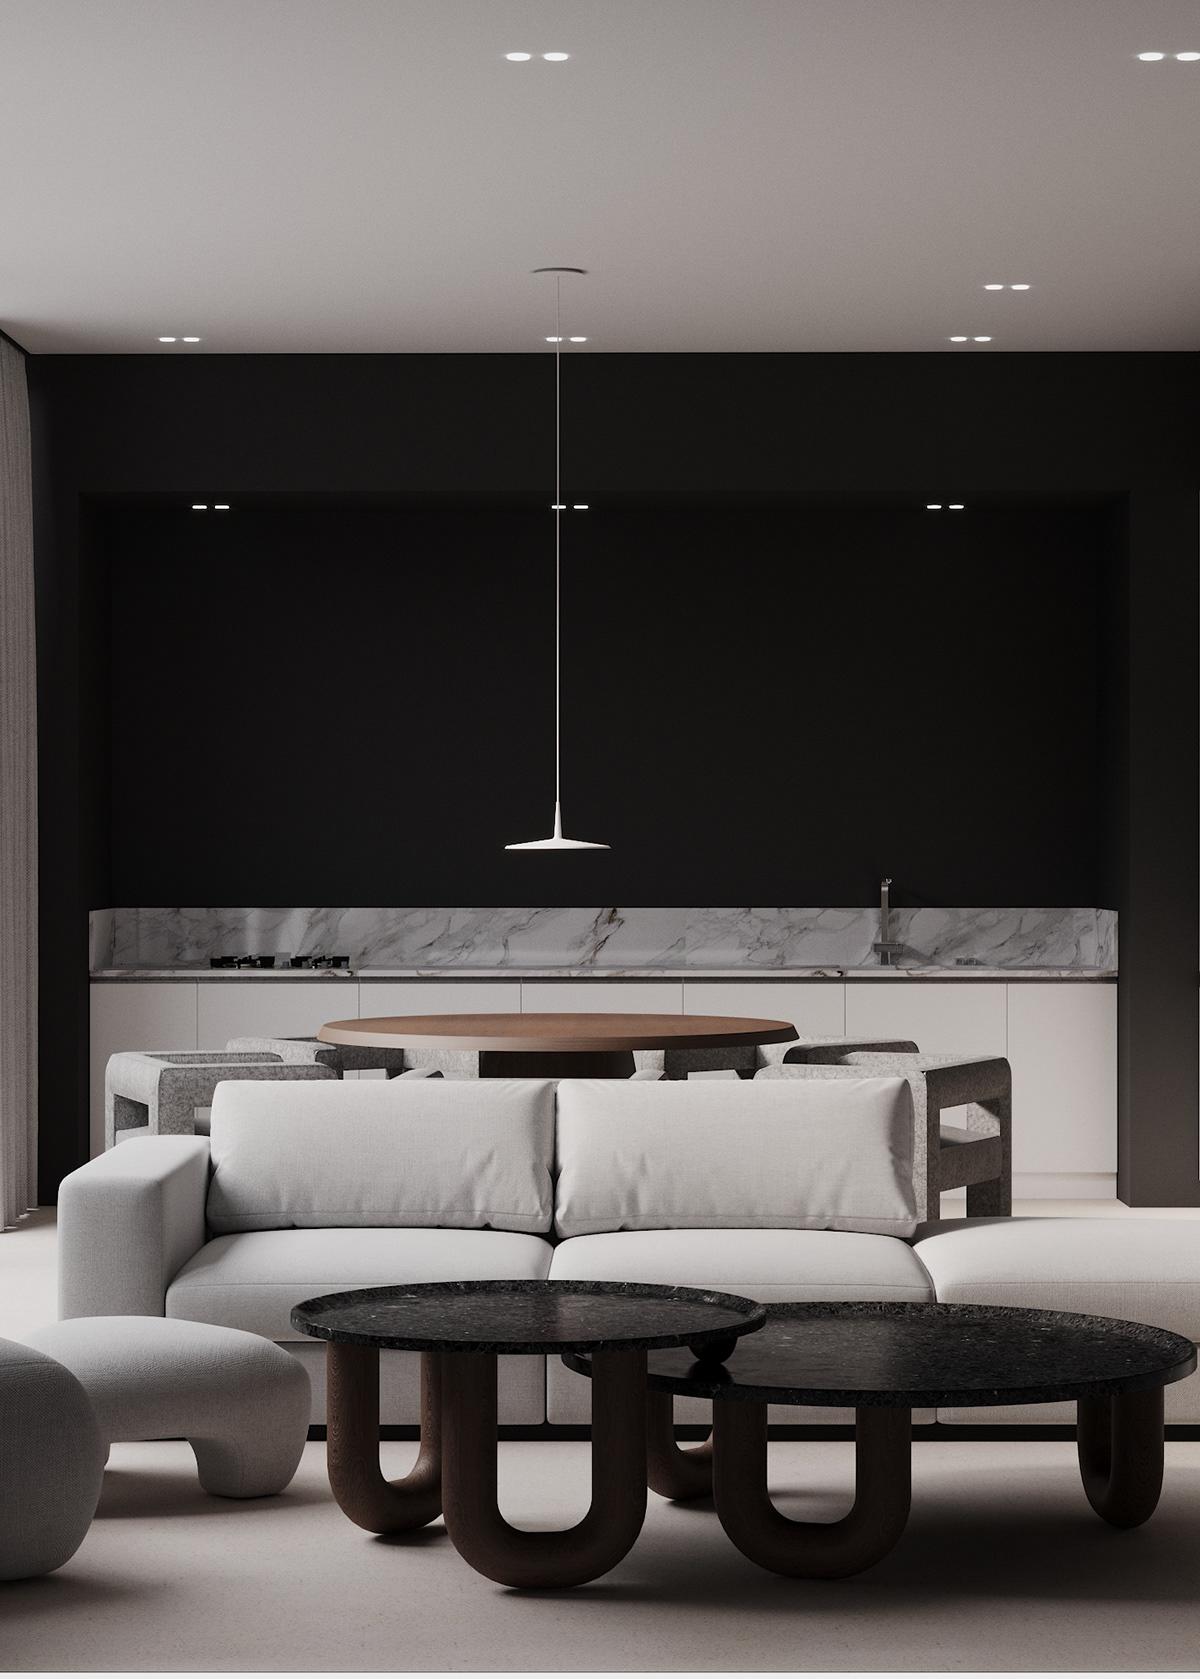 contemporary design Dark interior design design interior kitchen design minimalism design Minimalism interior Modern Design Render wood